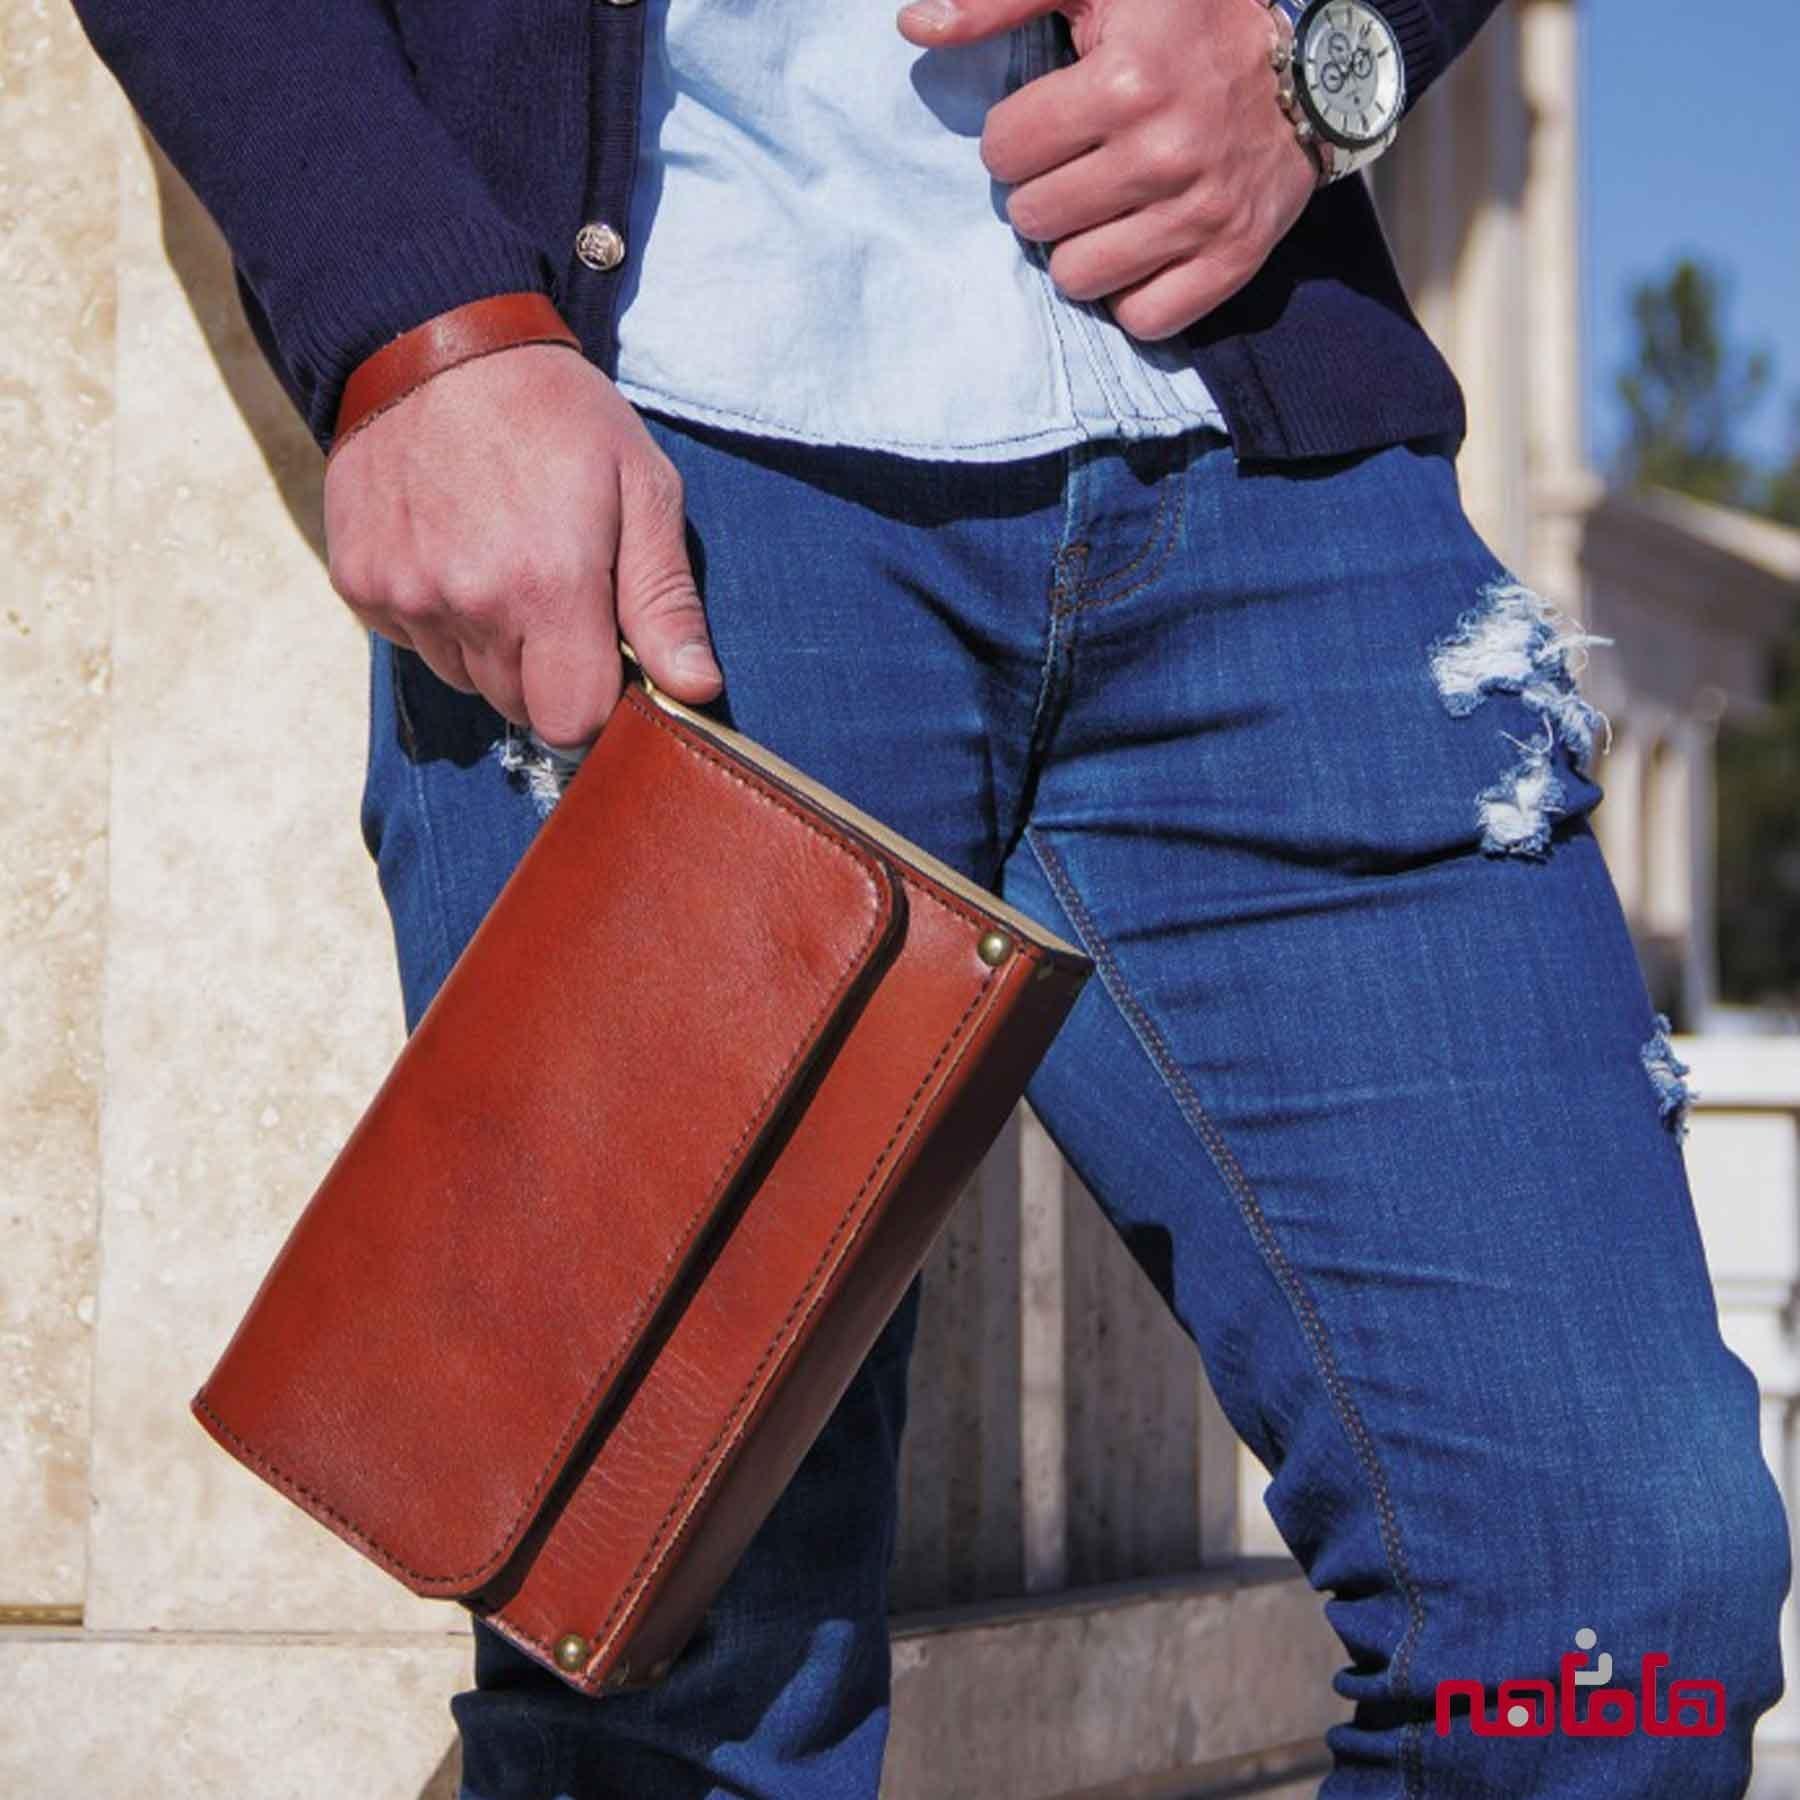 کیف چرم مردانه مدارک - اداری (چرم اصل گاوی)